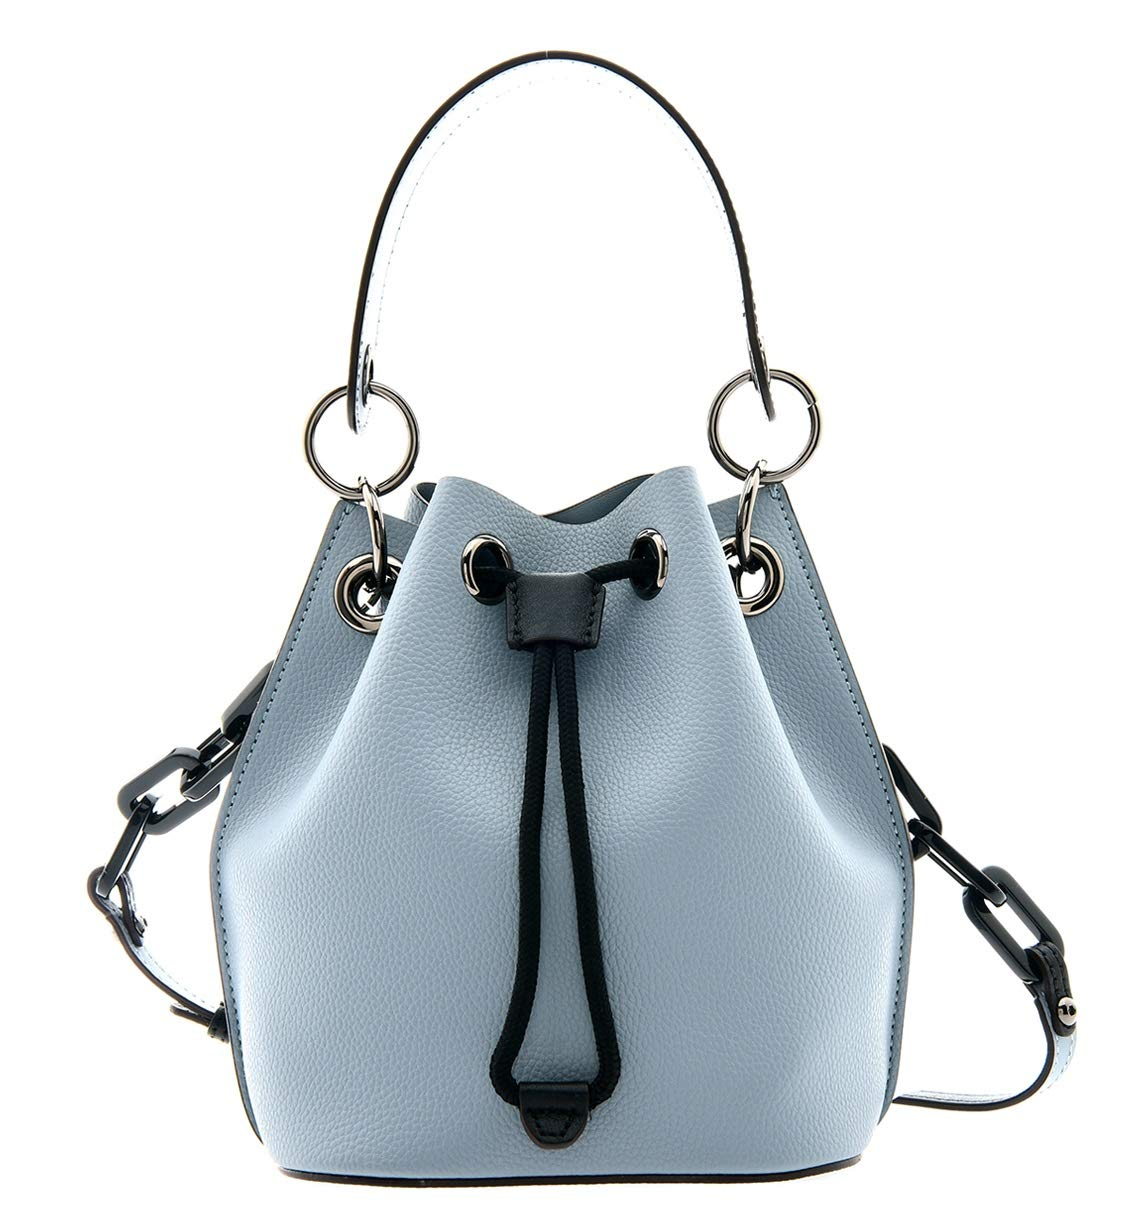 LOUIS QUATORZE Leather String Bucket Bag with Wrist Strap for Women  HM3LB07AB baaf5f0d55